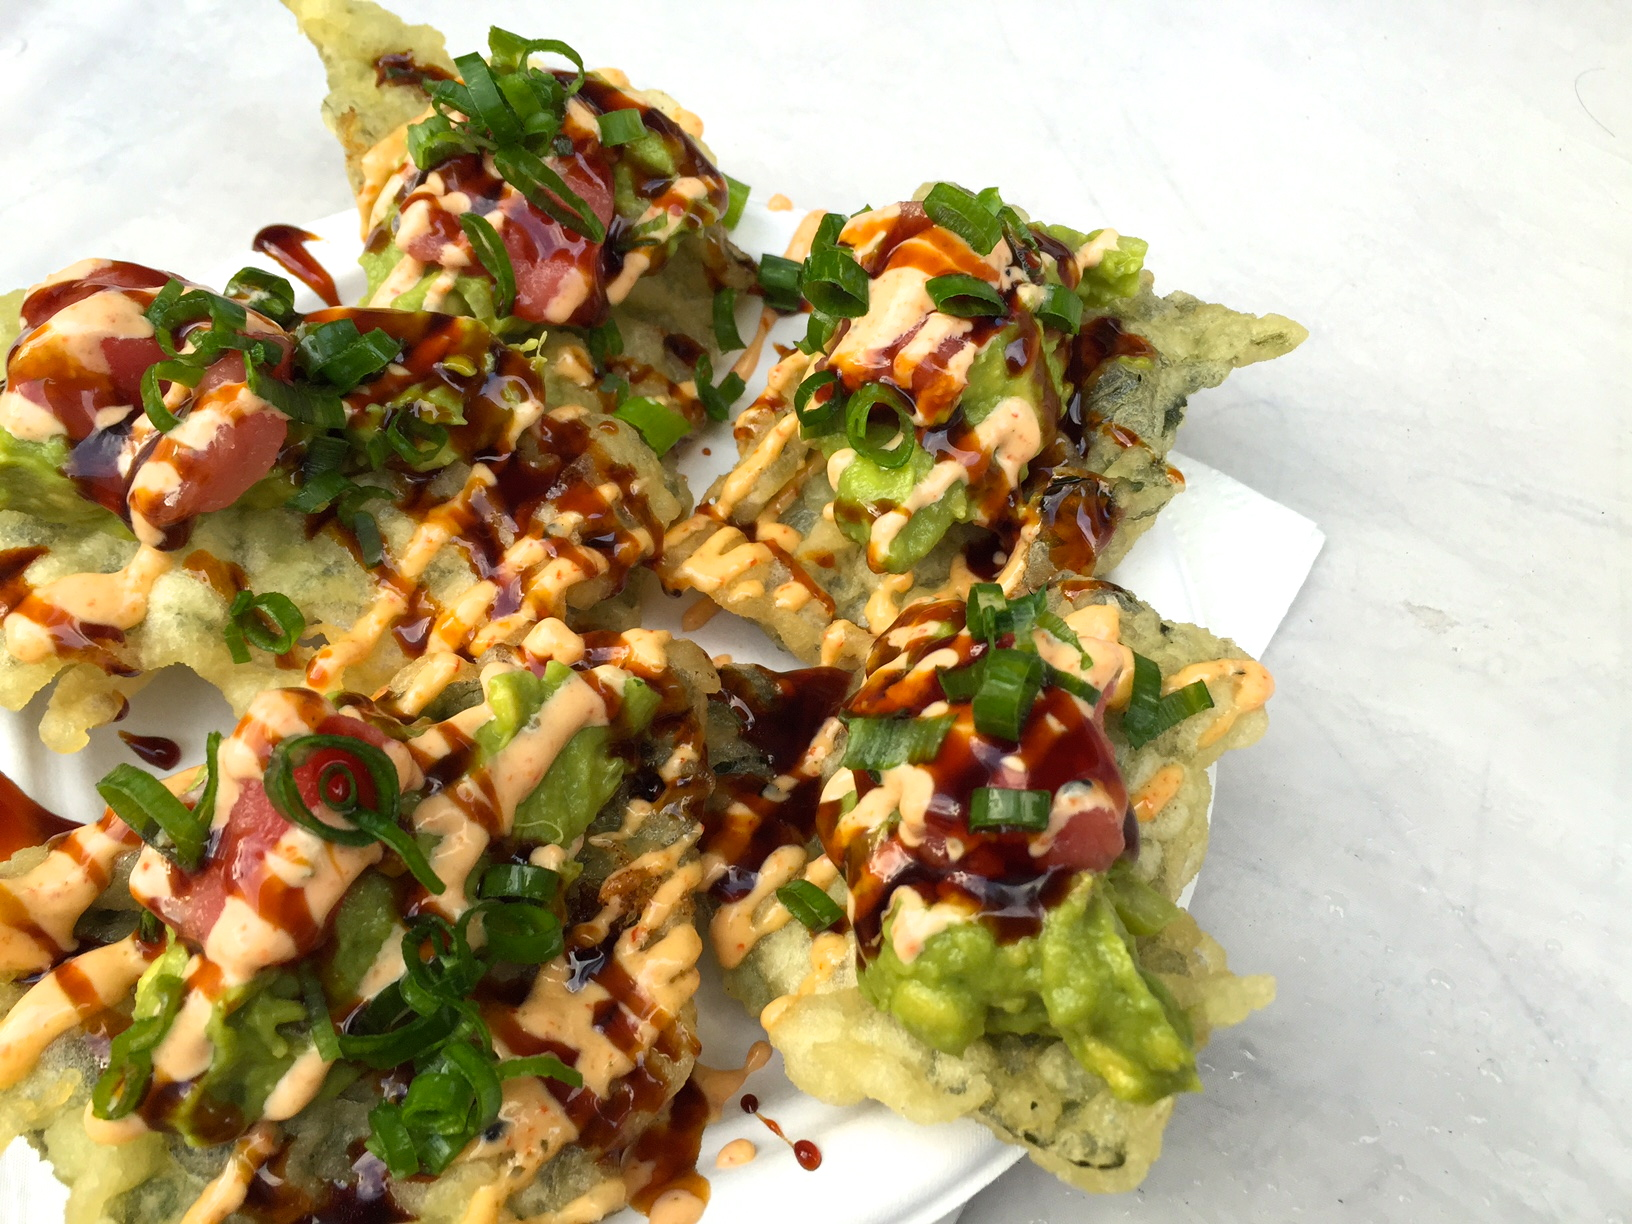 The killer dish at the  Otsuji Farms  stand-' Crispy Nori with Poke Tuna + Avocado+Scallions+Spicy Mayo.